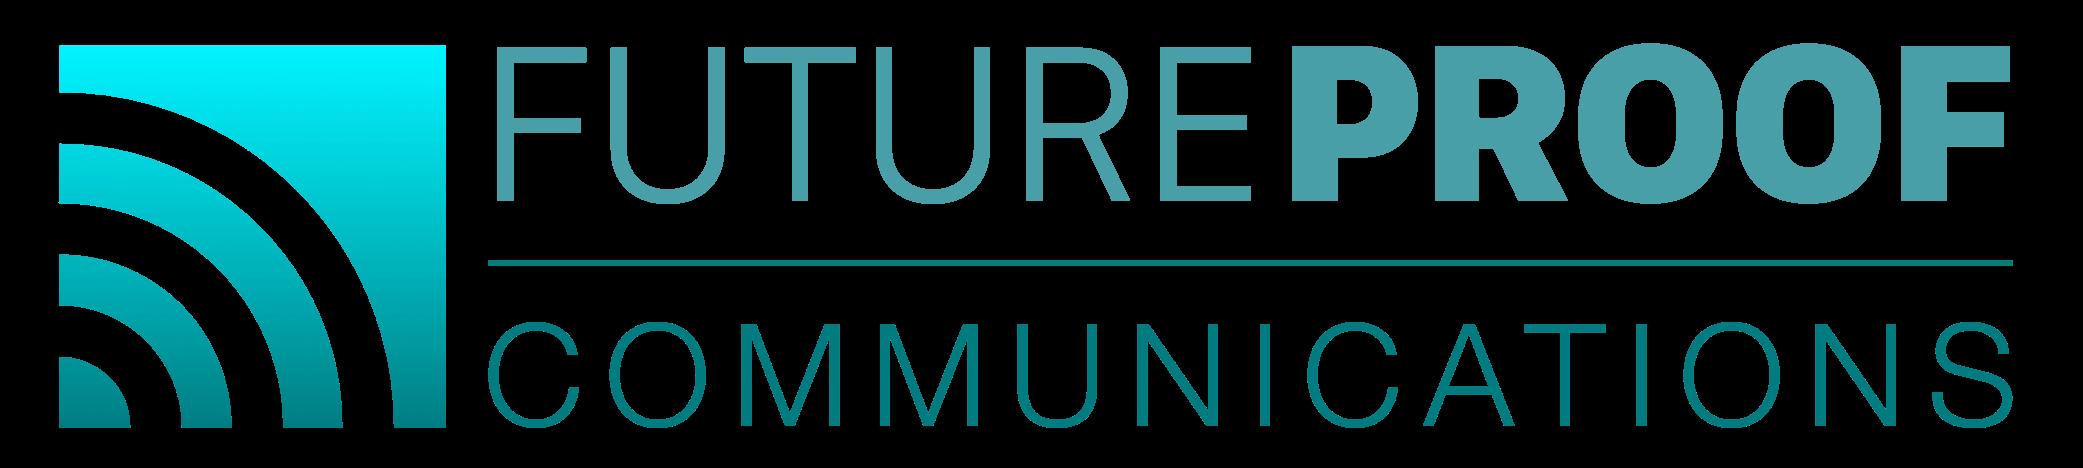 Future Proof Communications